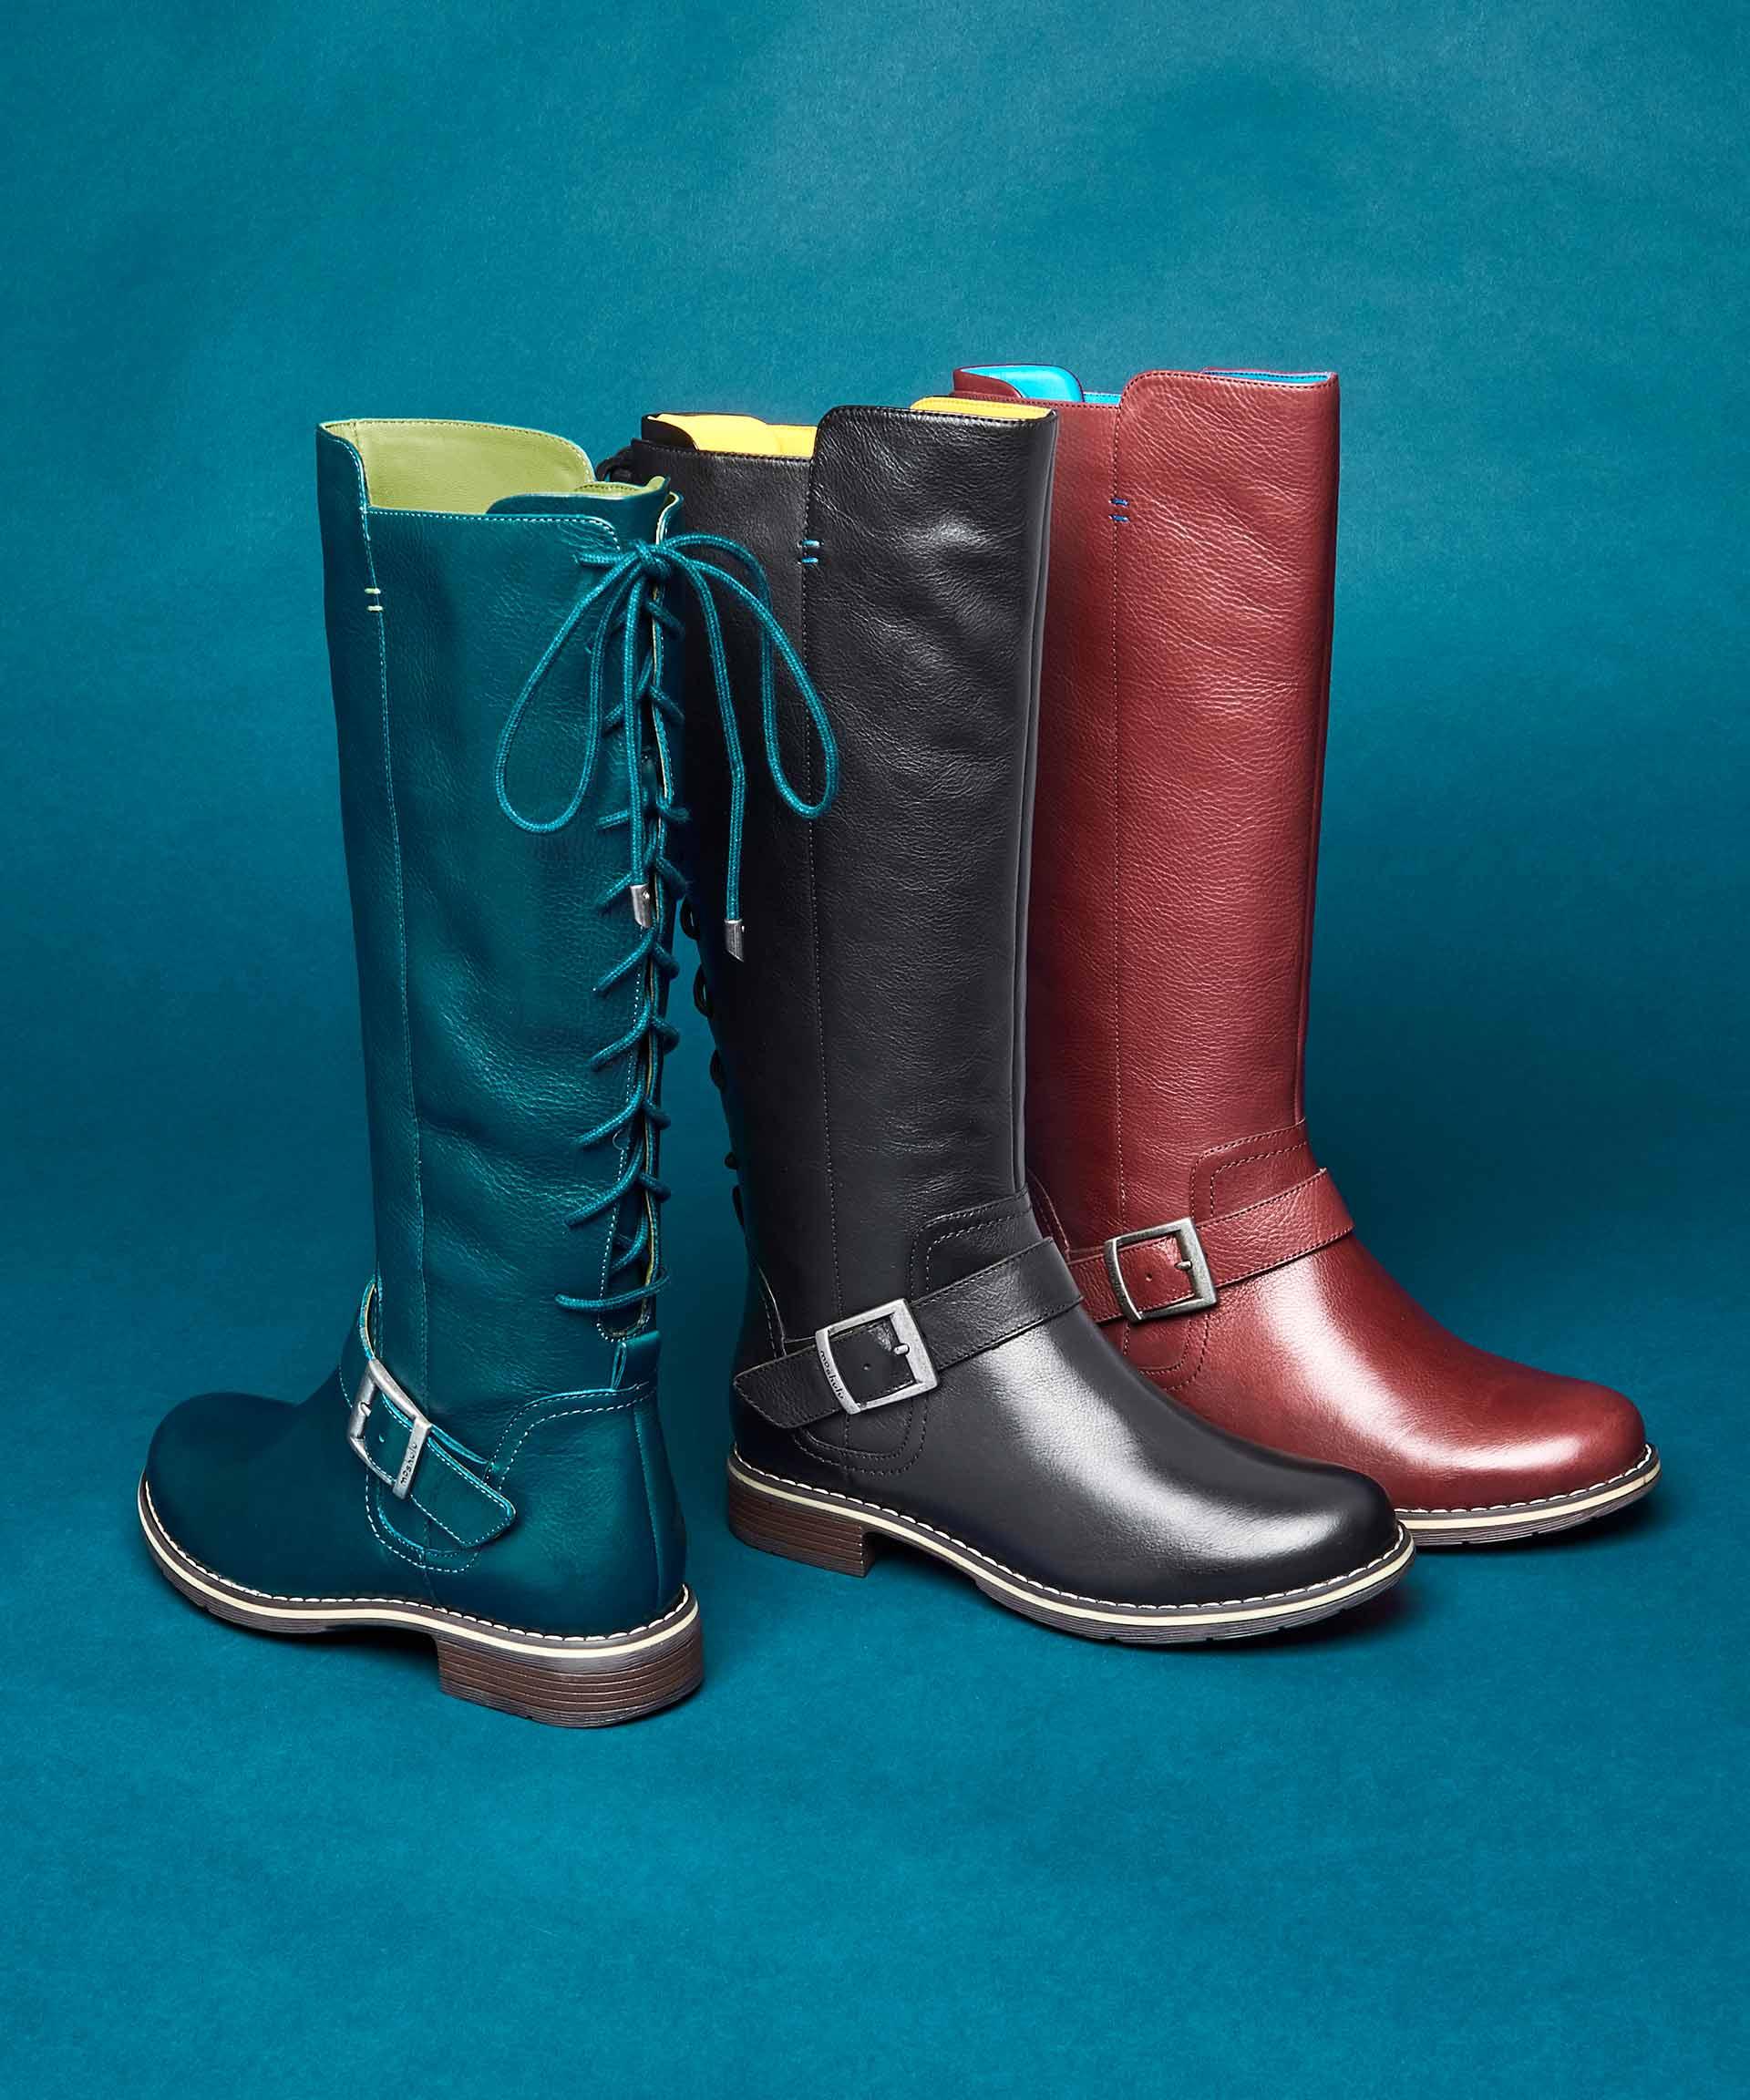 Knave ladies long boots